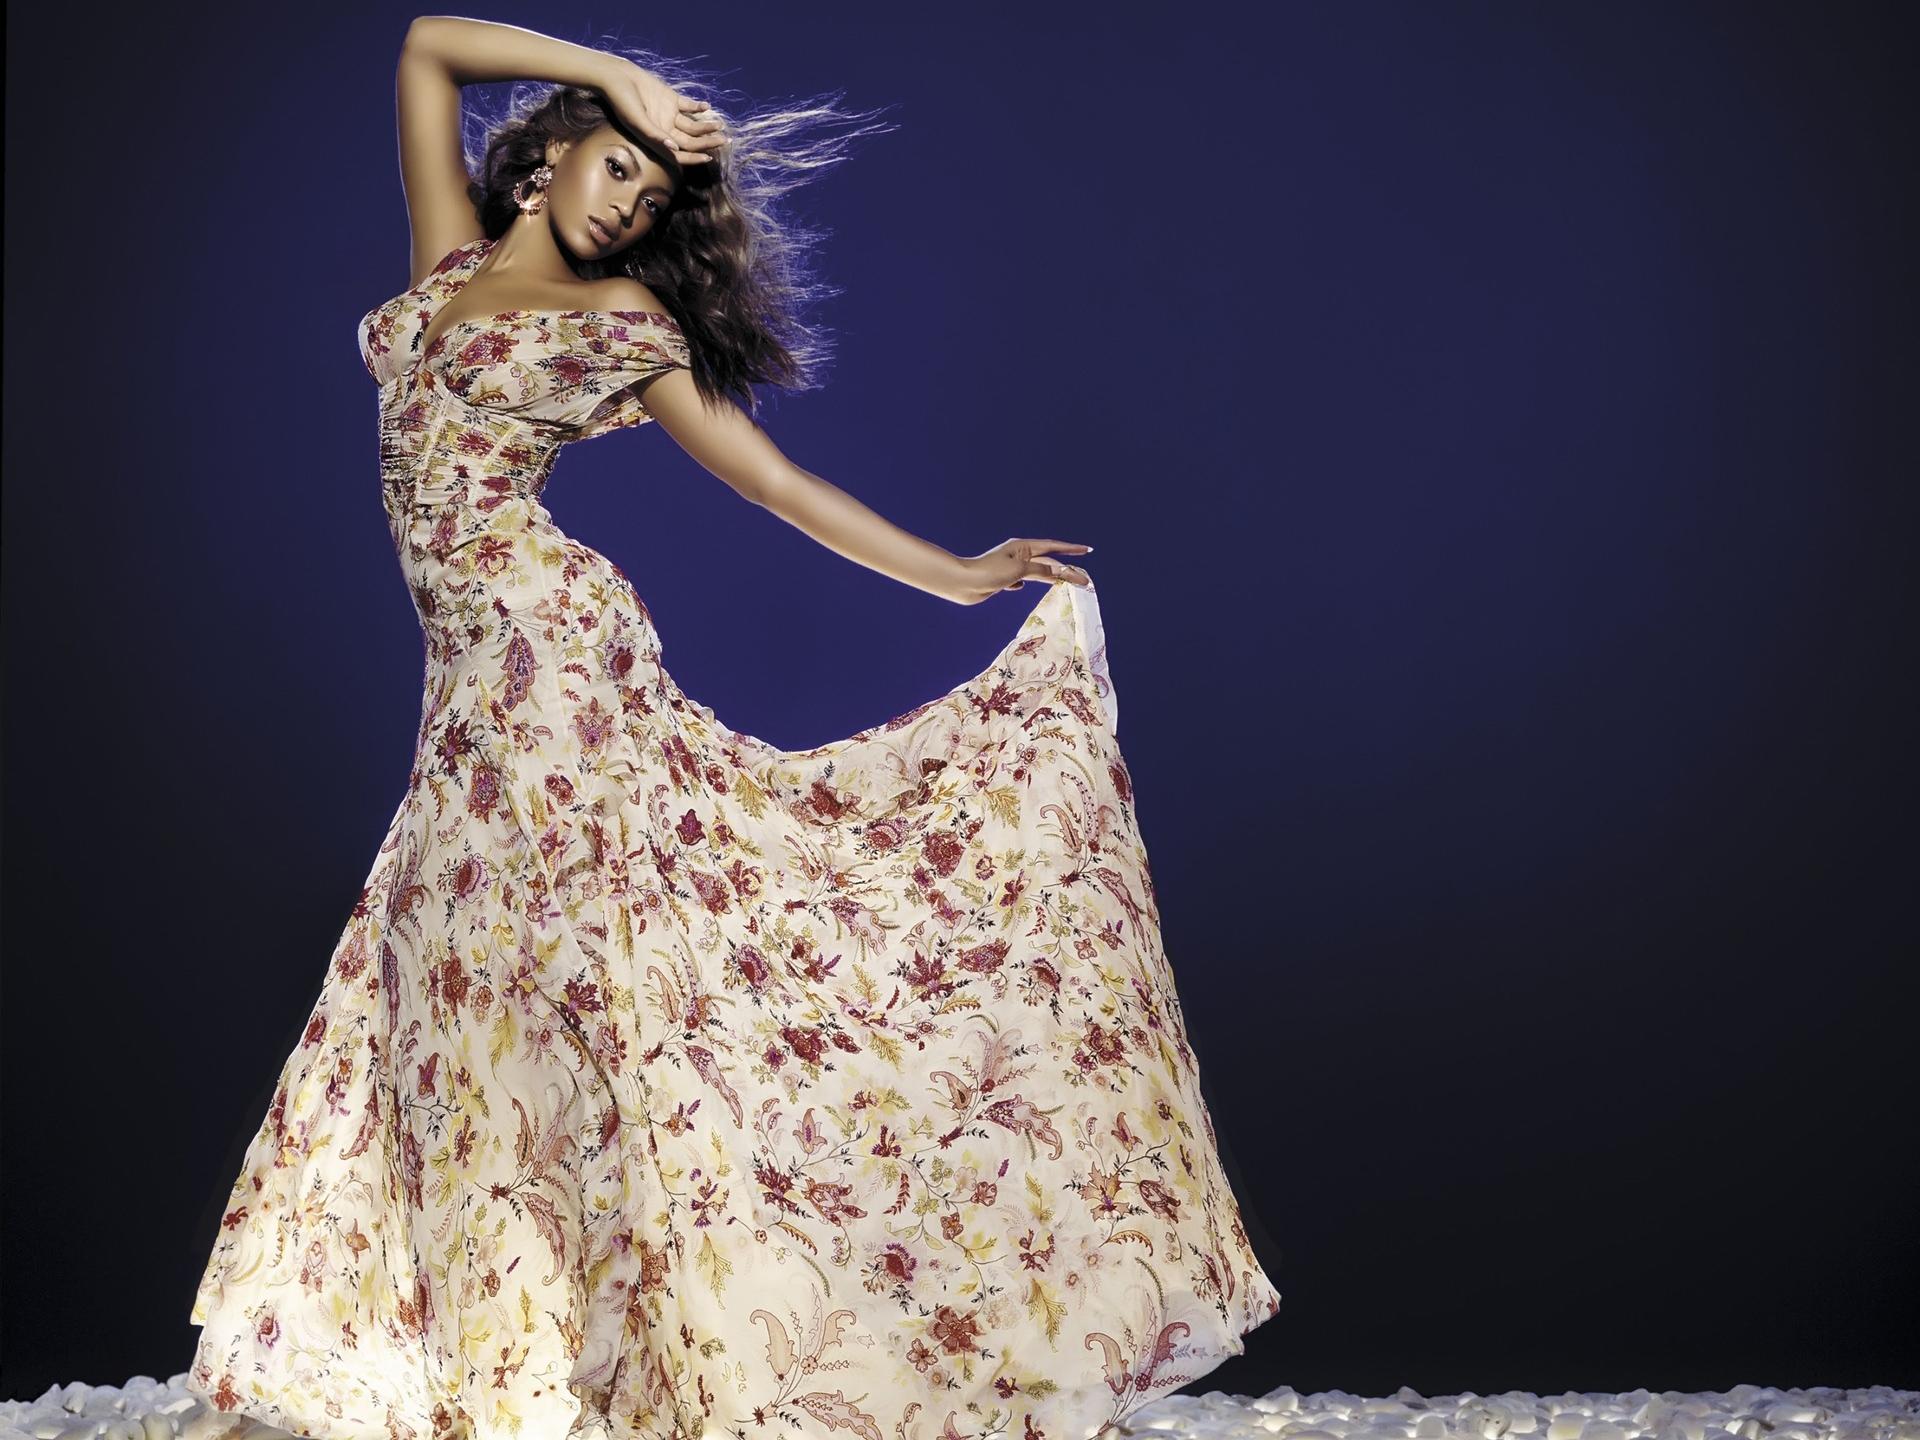 Beyonce Knowles 40 wallpaper